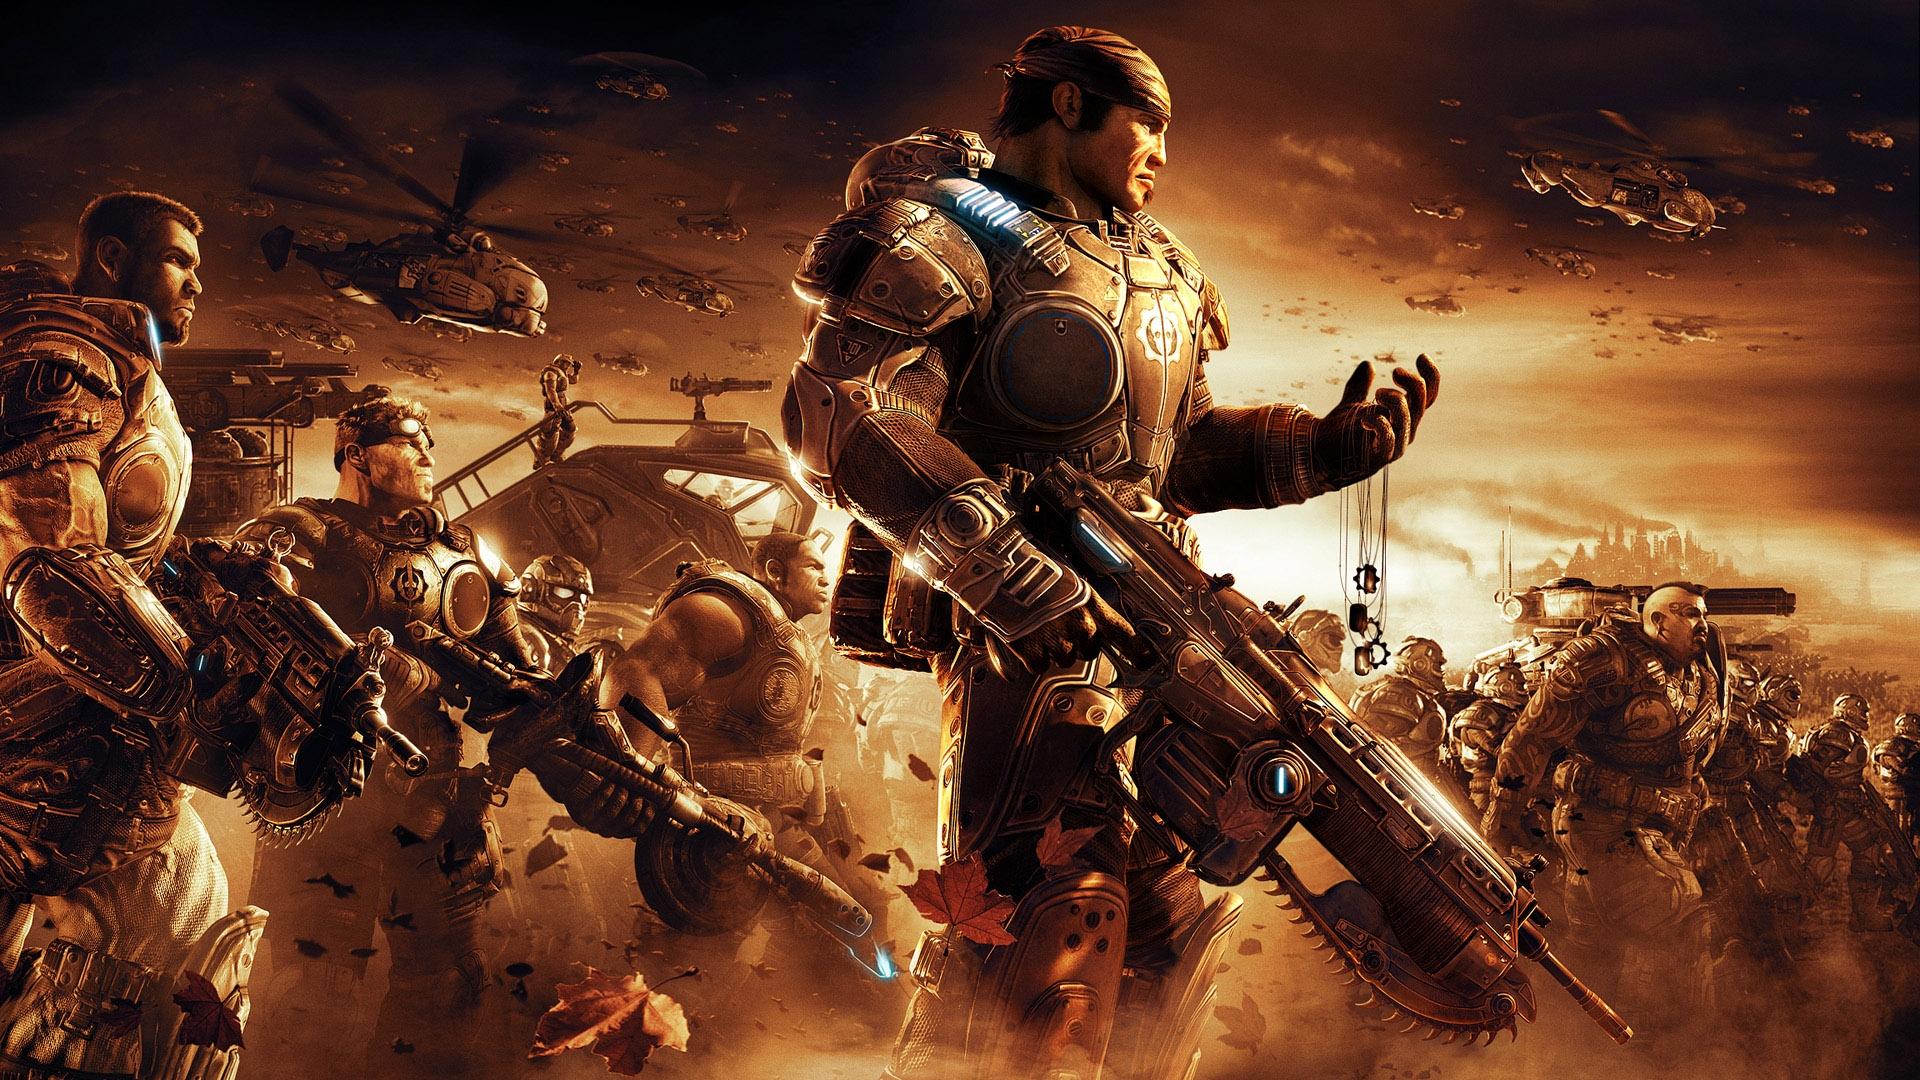 gears of war 3 wallpaper 35046